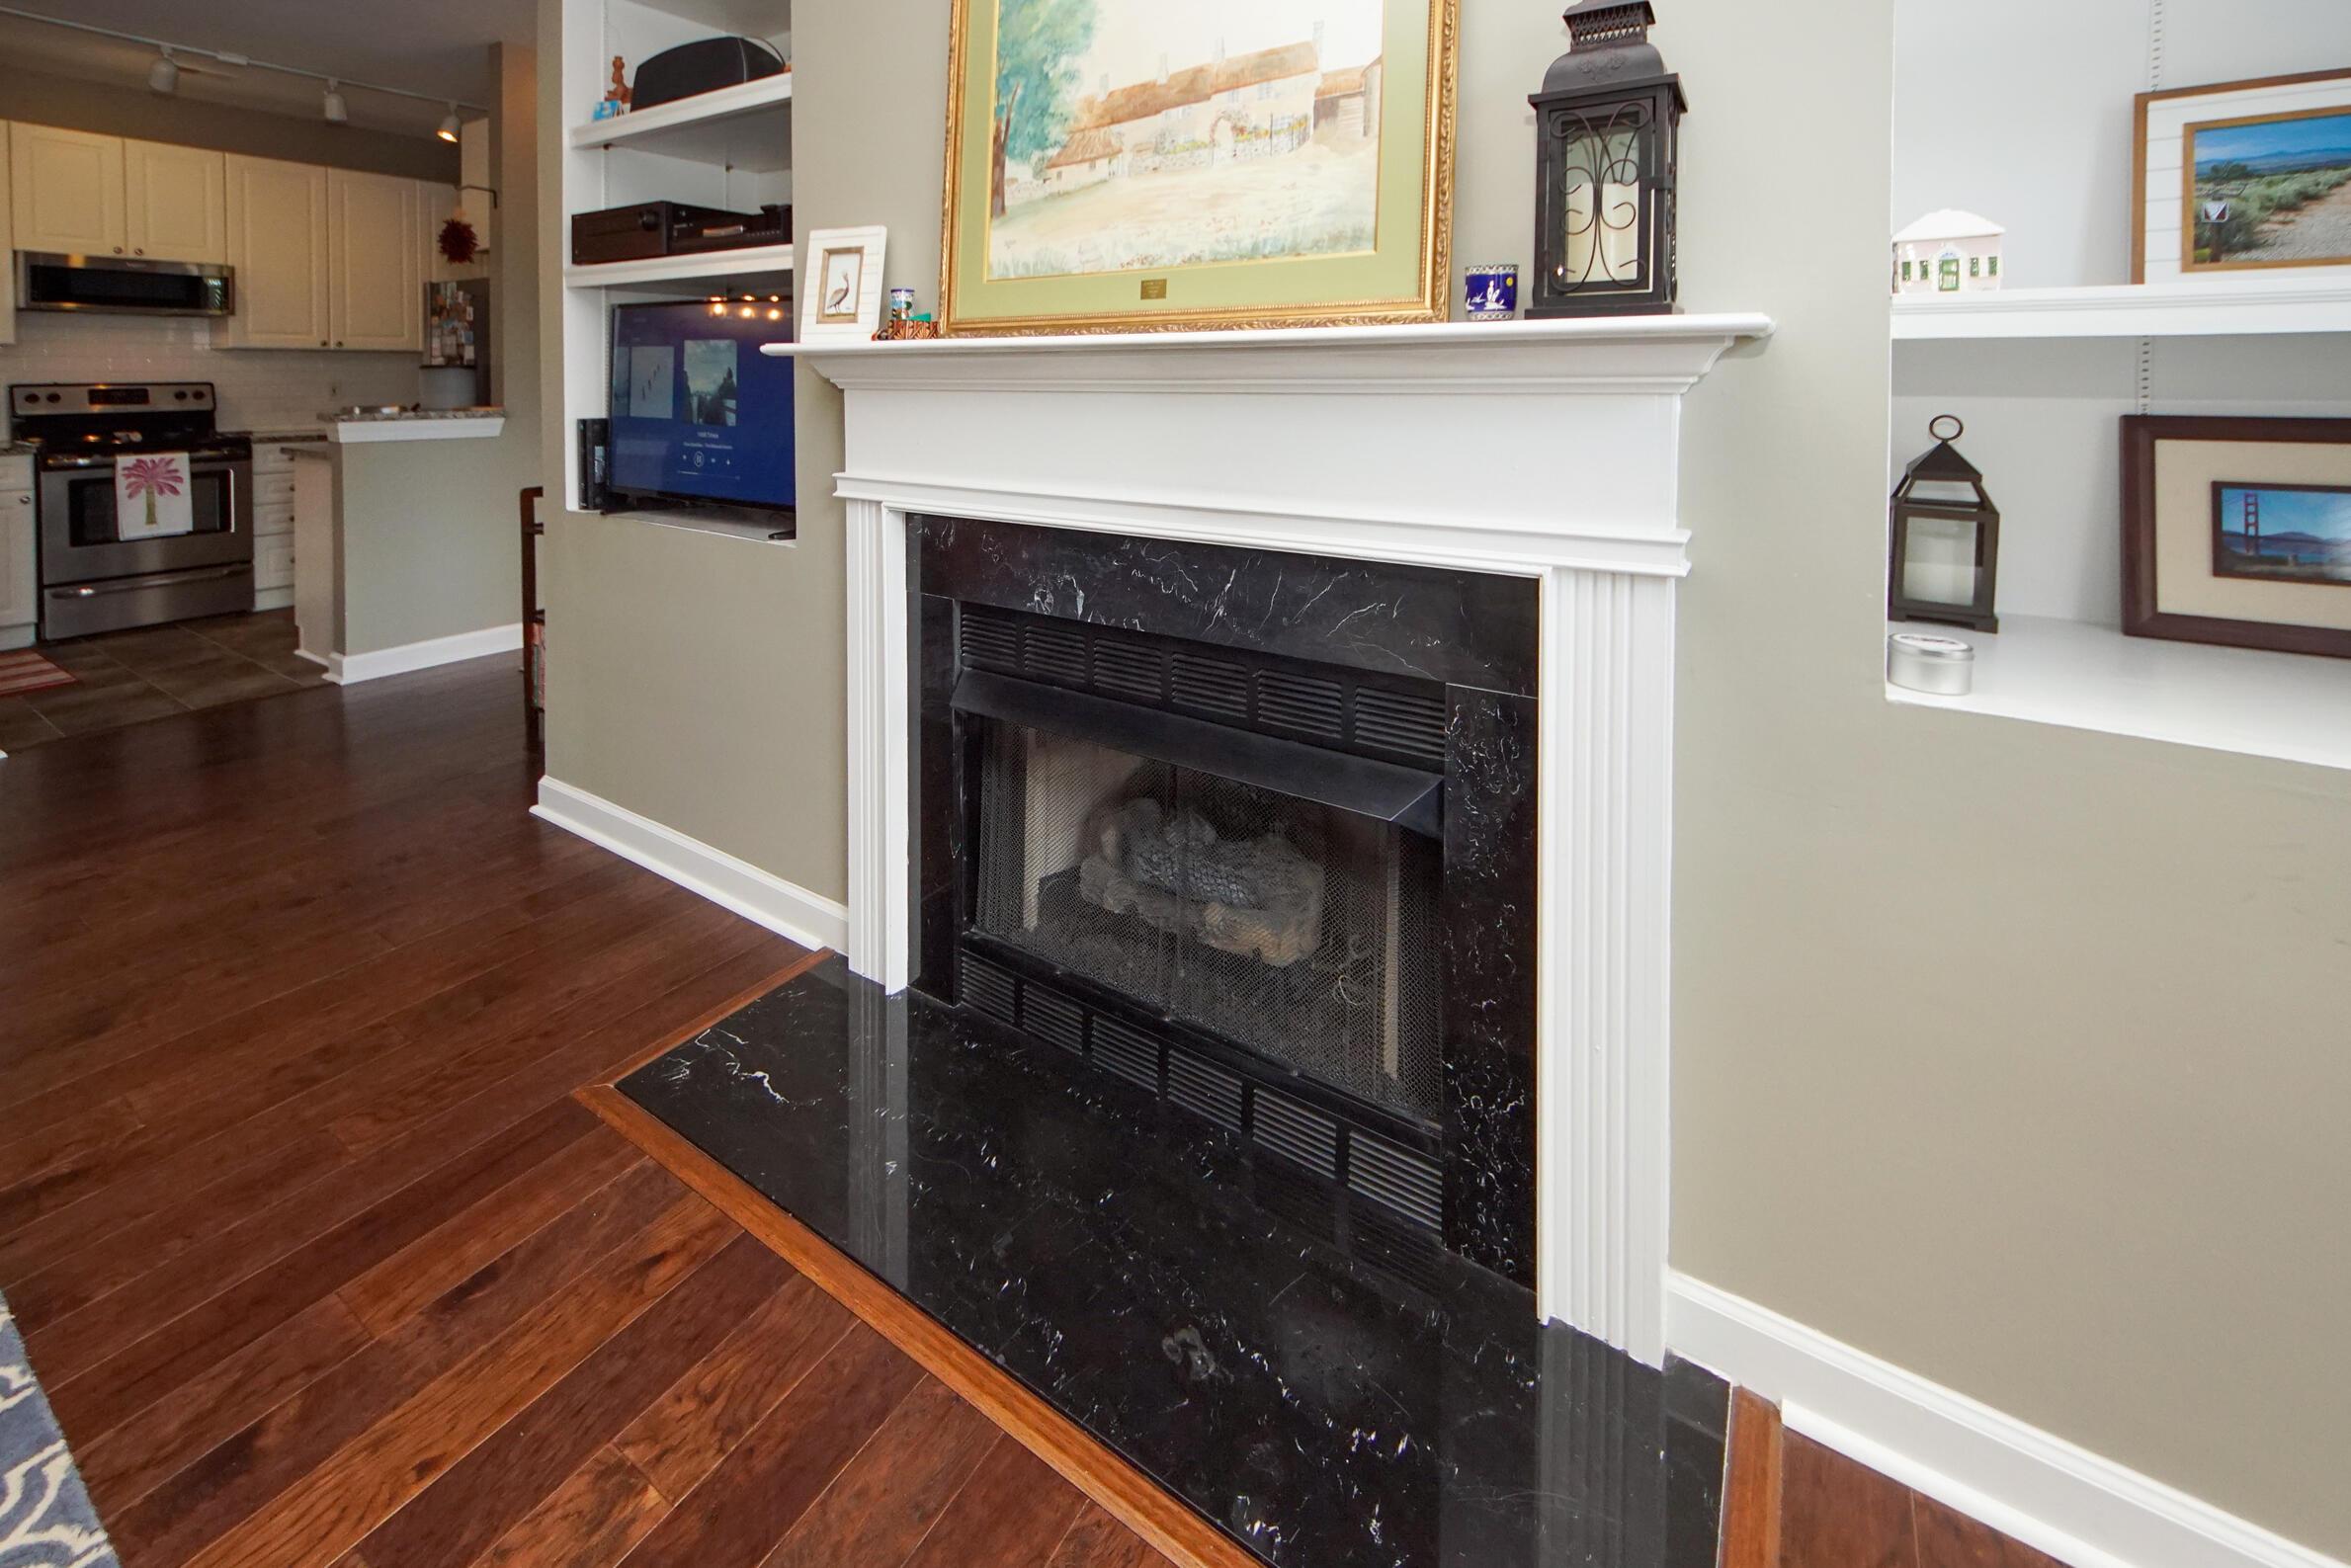 Dunes West Homes For Sale - 1631 Camfield, Mount Pleasant, SC - 7